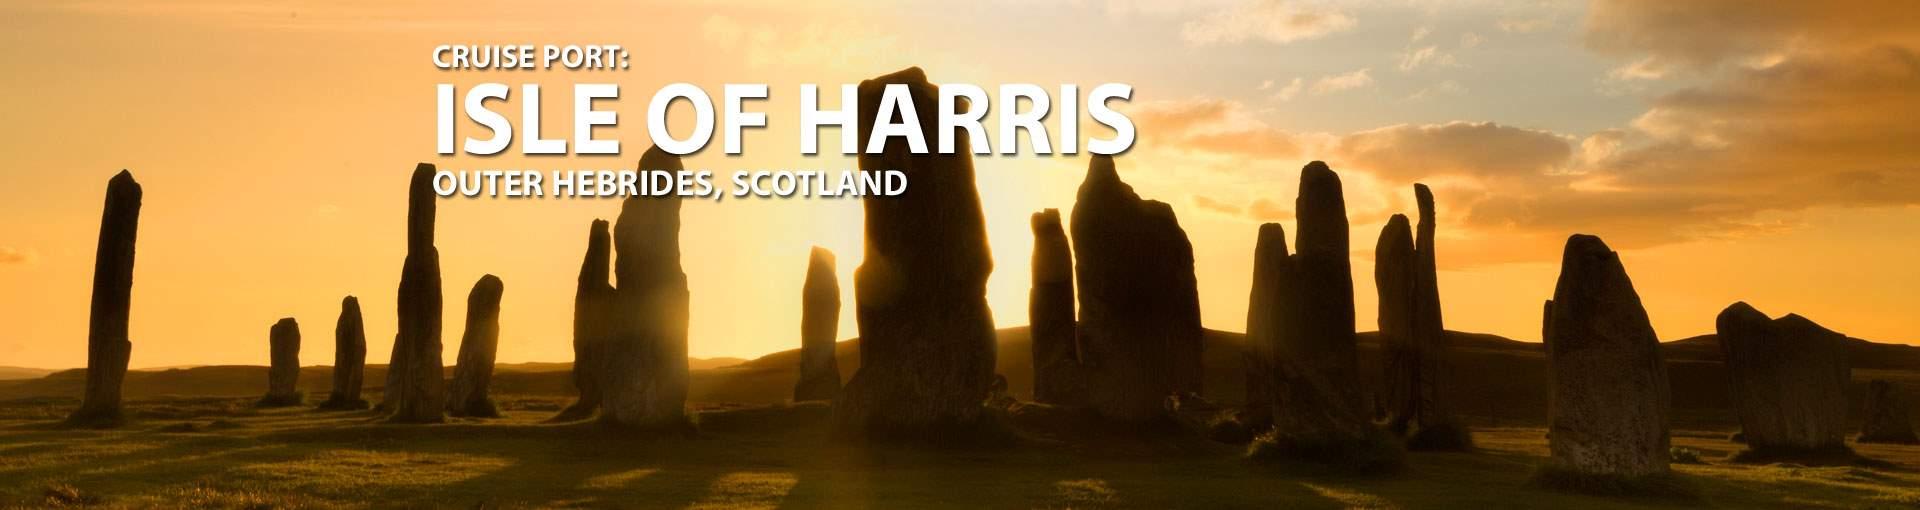 Cruises to Isle of Harris, Scotland